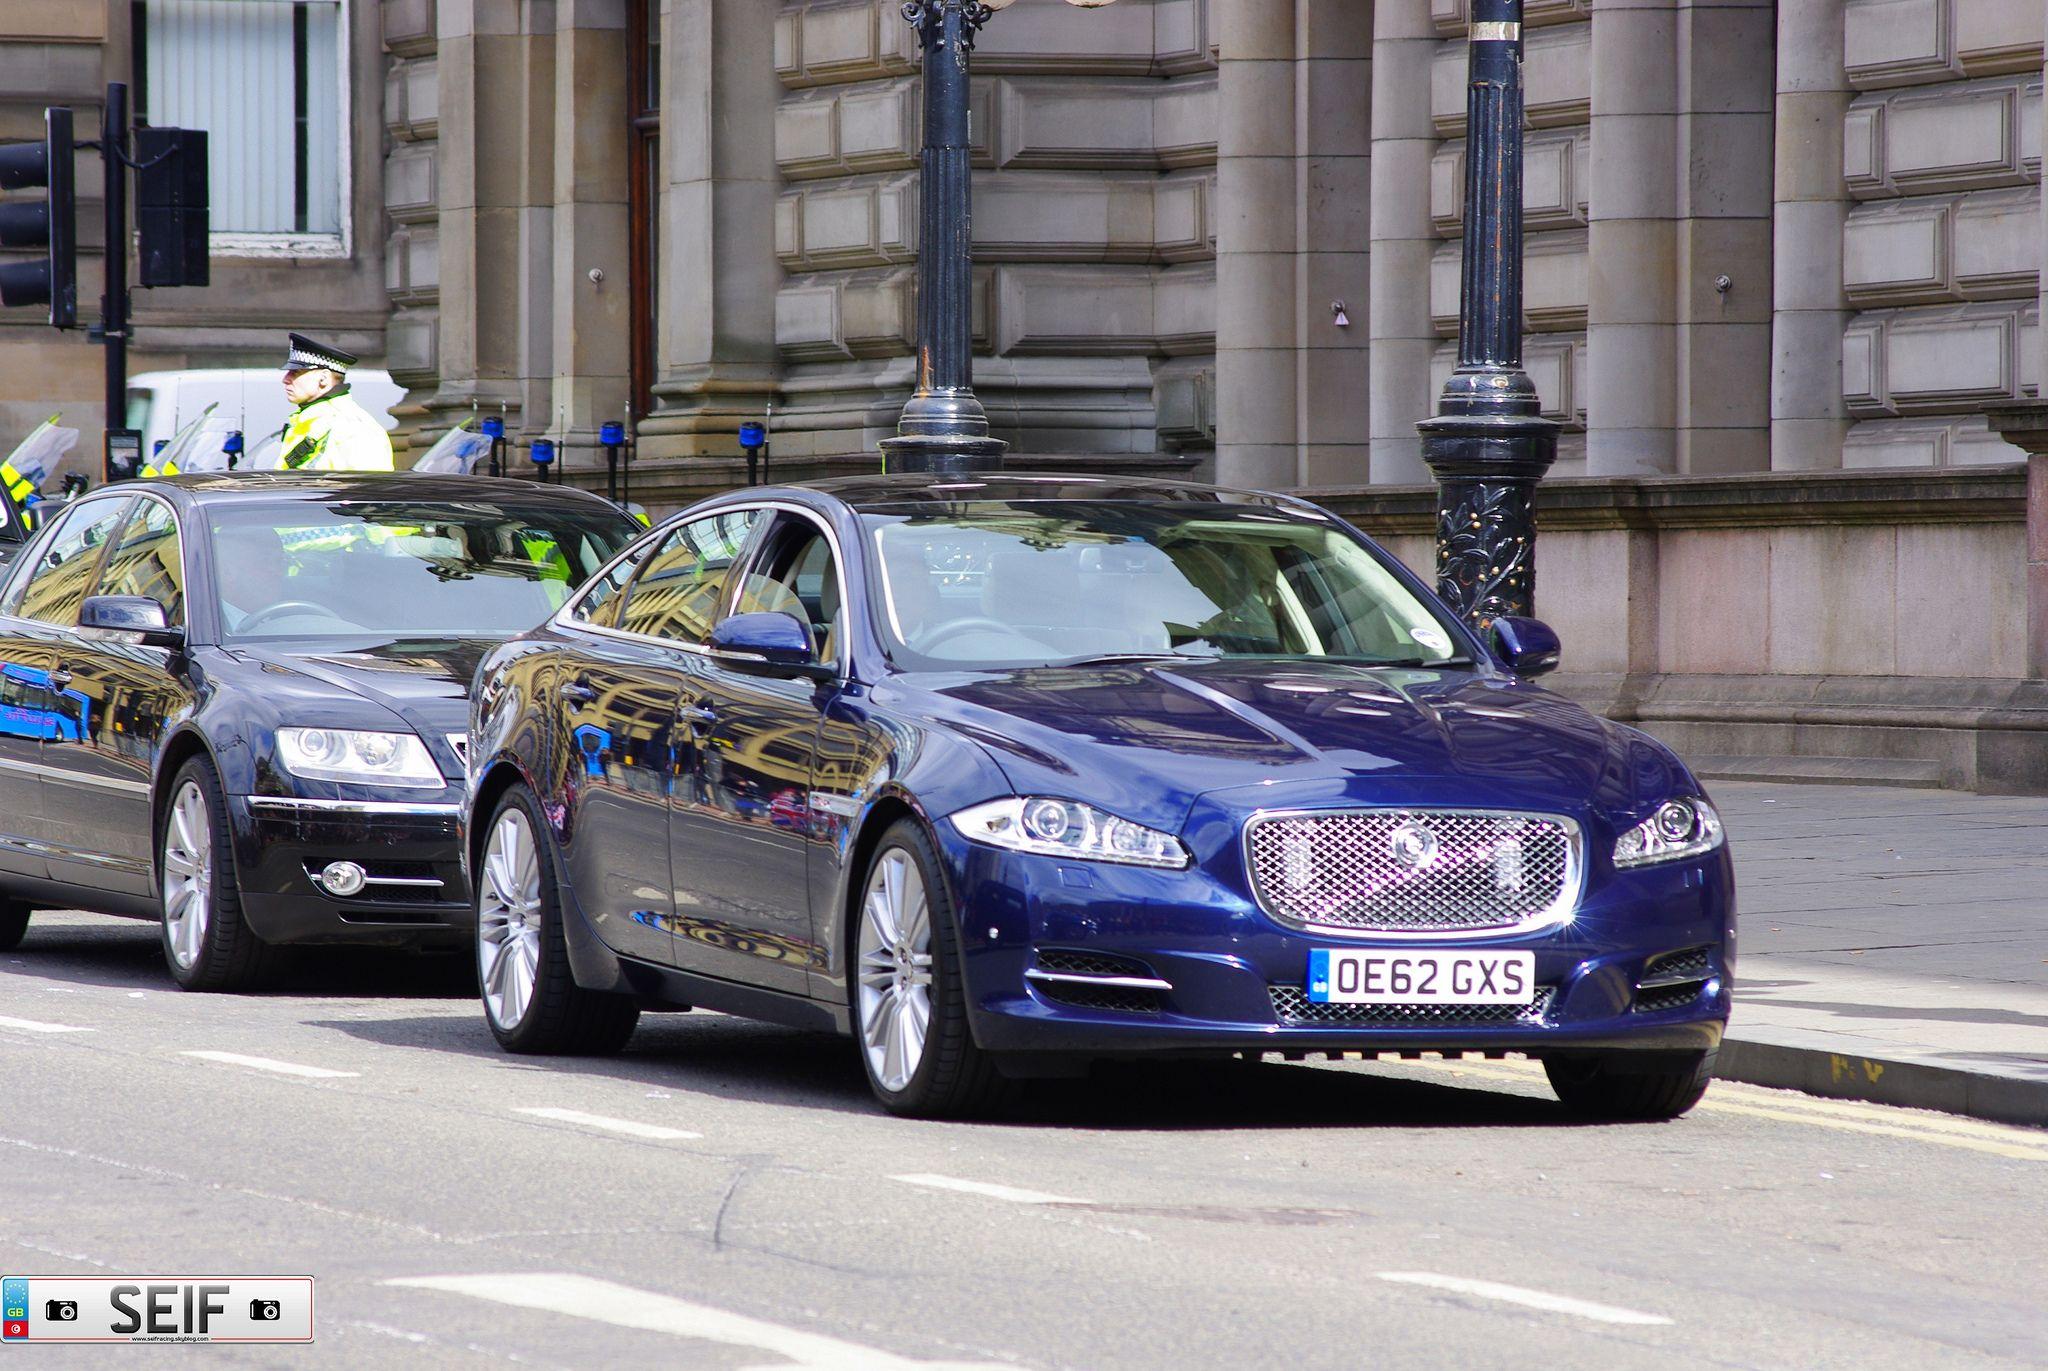 Jaguar Xlj Glasgow2013 Jaguar Armored Vehicles Police Cars